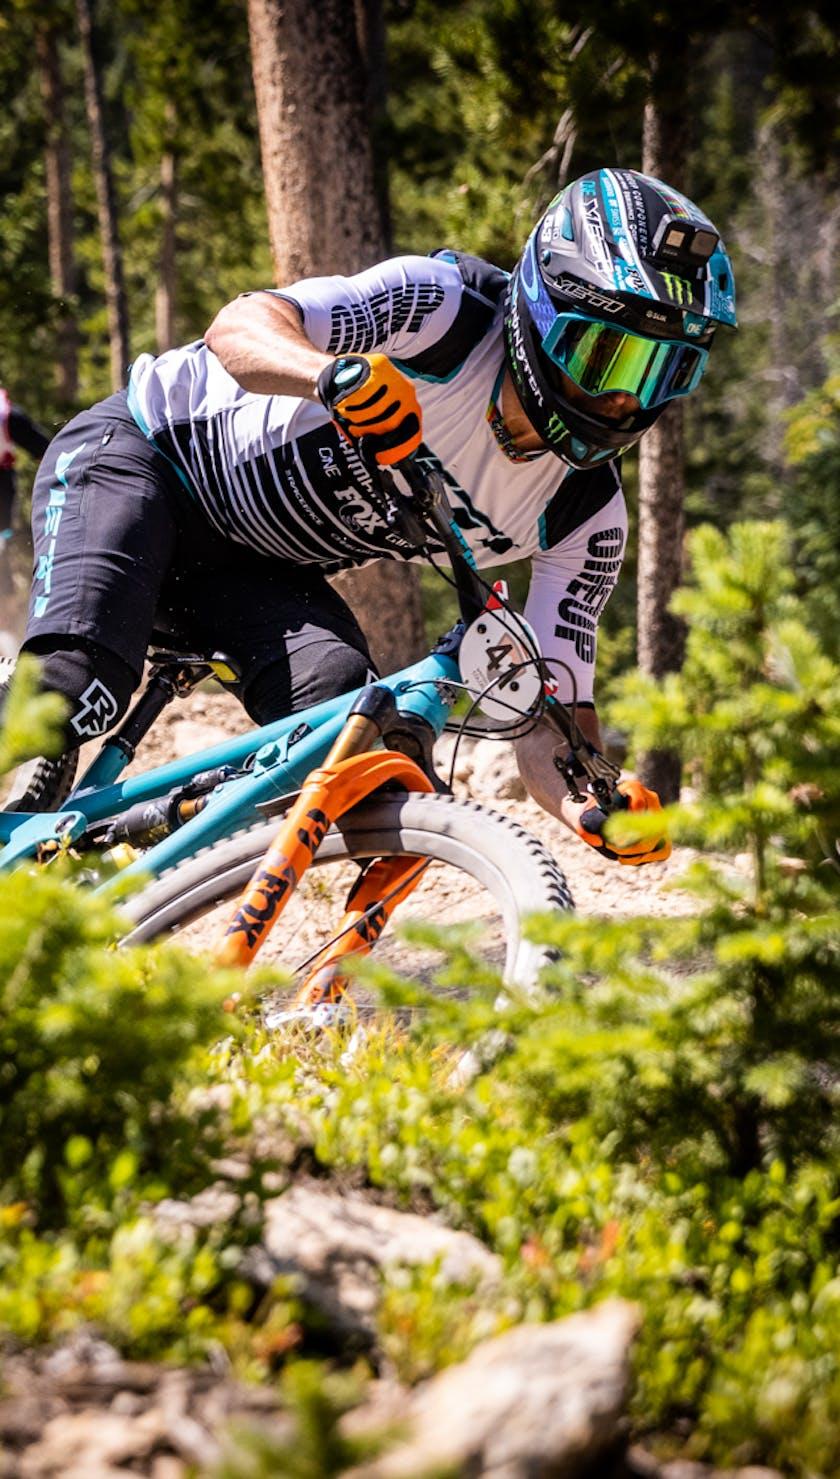 BME 21 Winter Park - Jared Graves